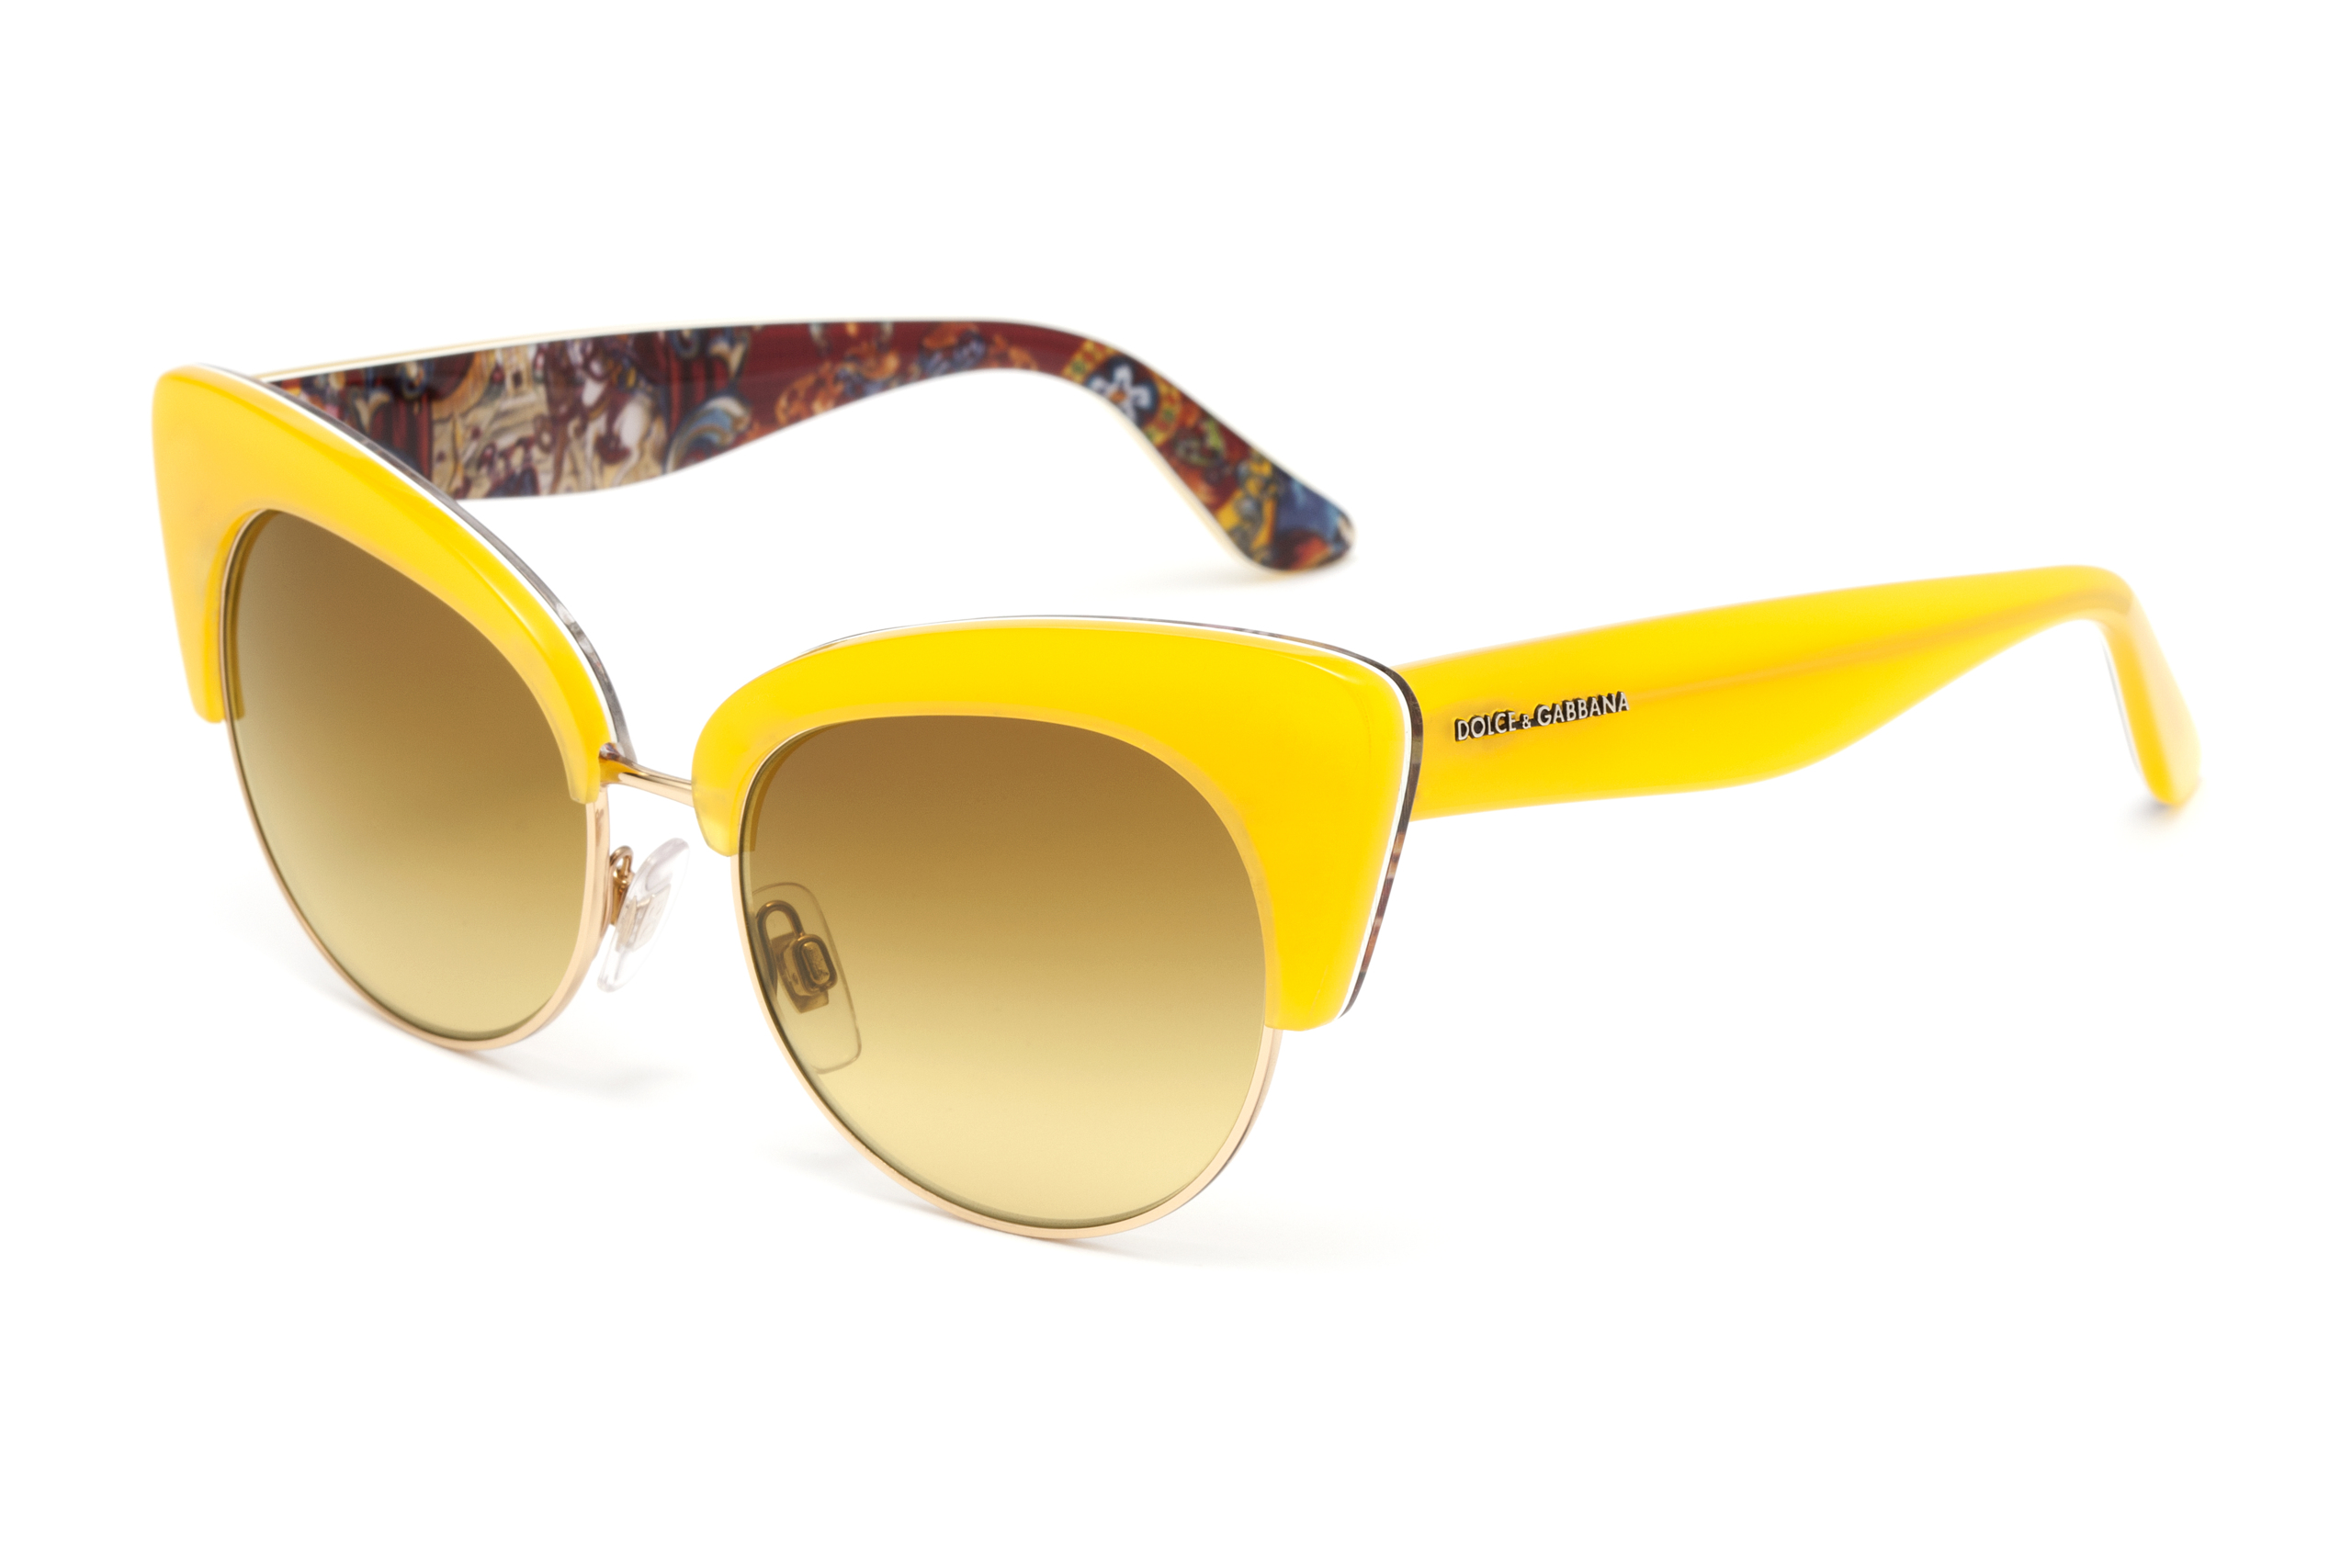 Foto de Gafas de sol Dolce Gabbana Sicilian Carretto (3/12)